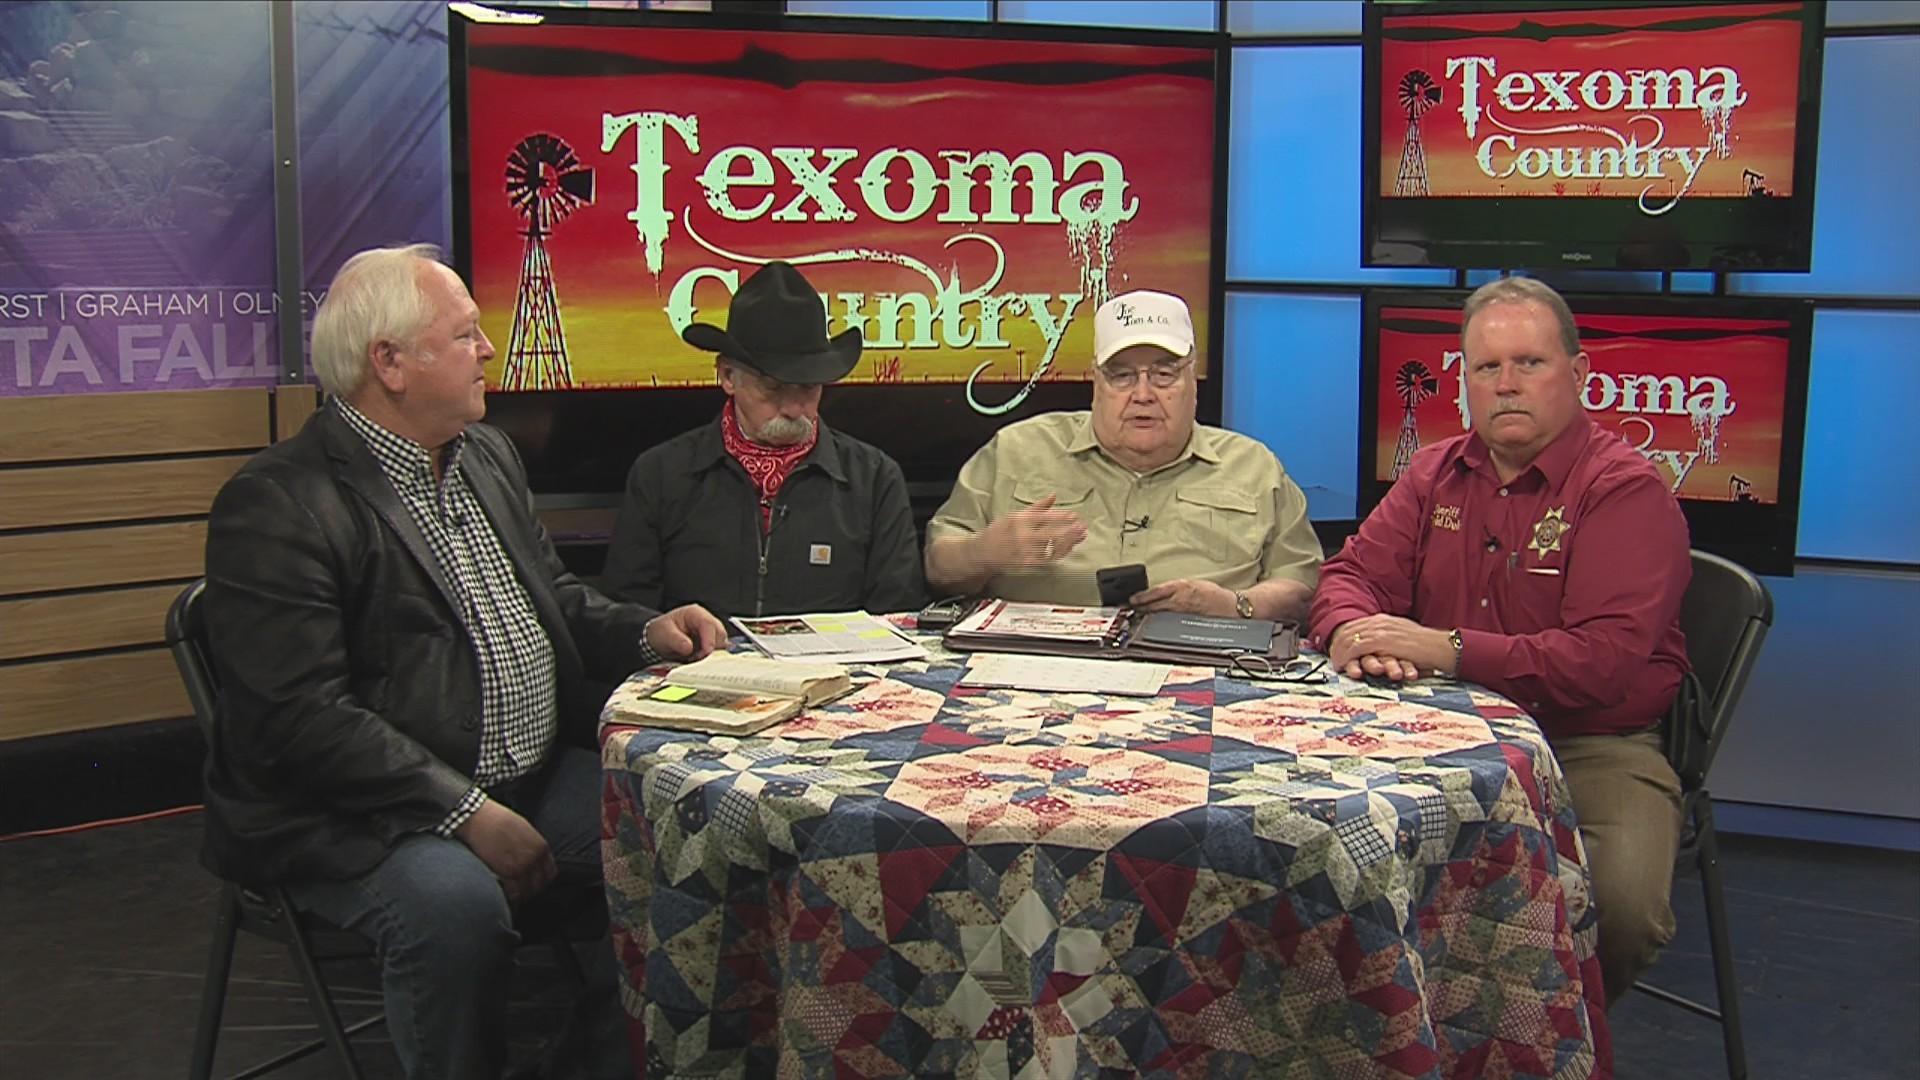 Texoma Country Morning 12/5/18 4